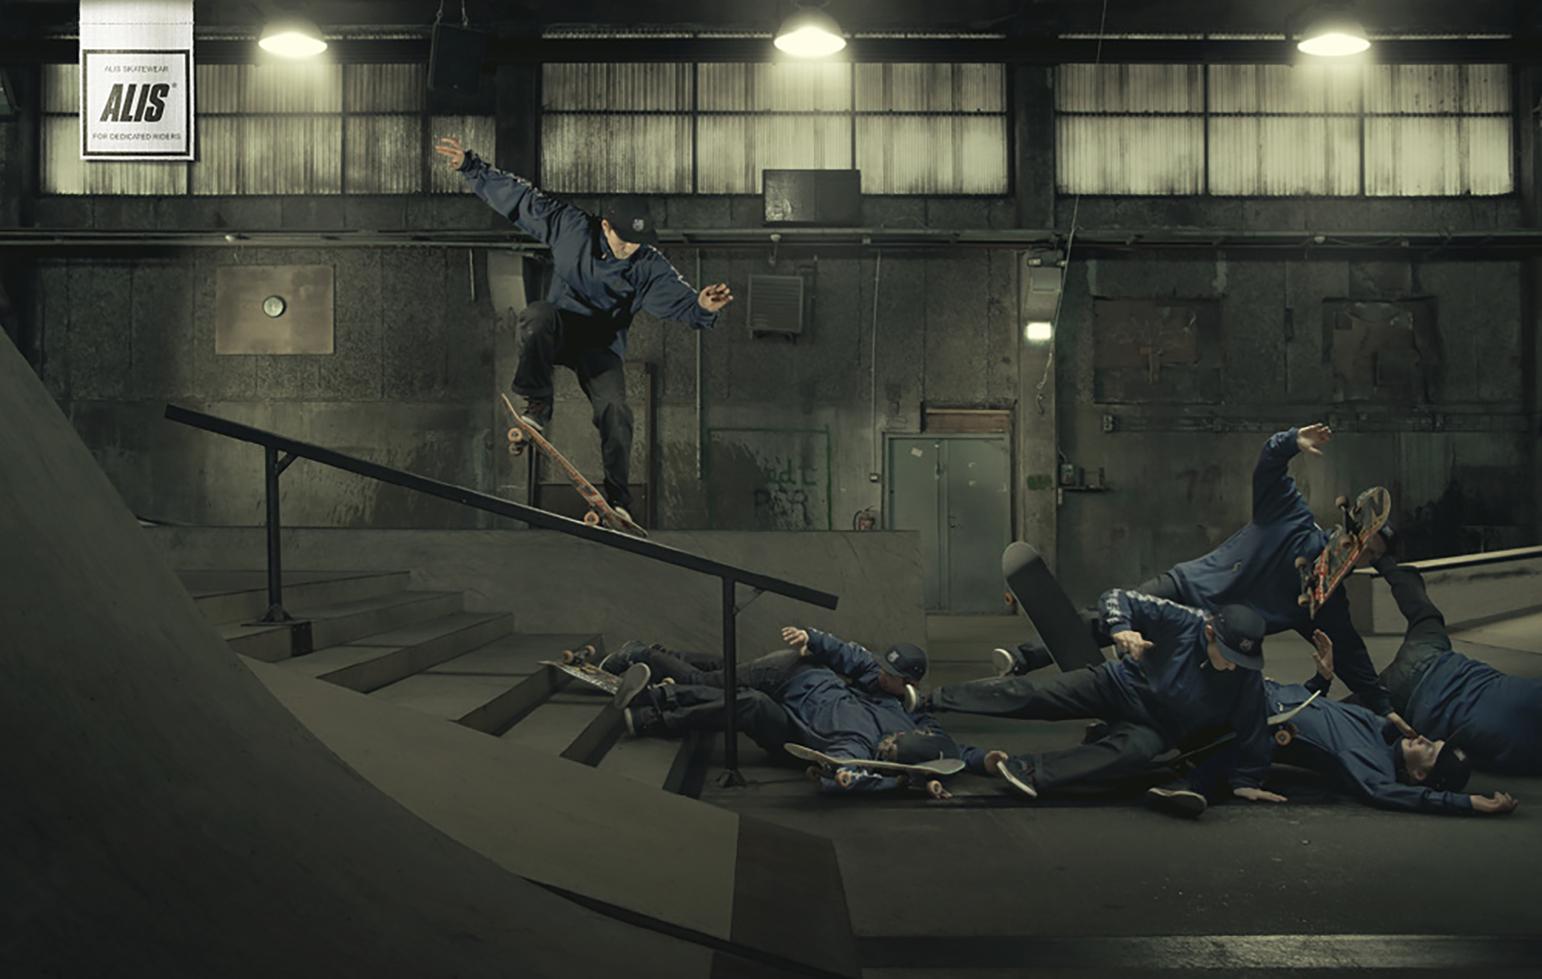 Alis_Skatewear_For_Dedicated_Riders_Rail_1000.jpg